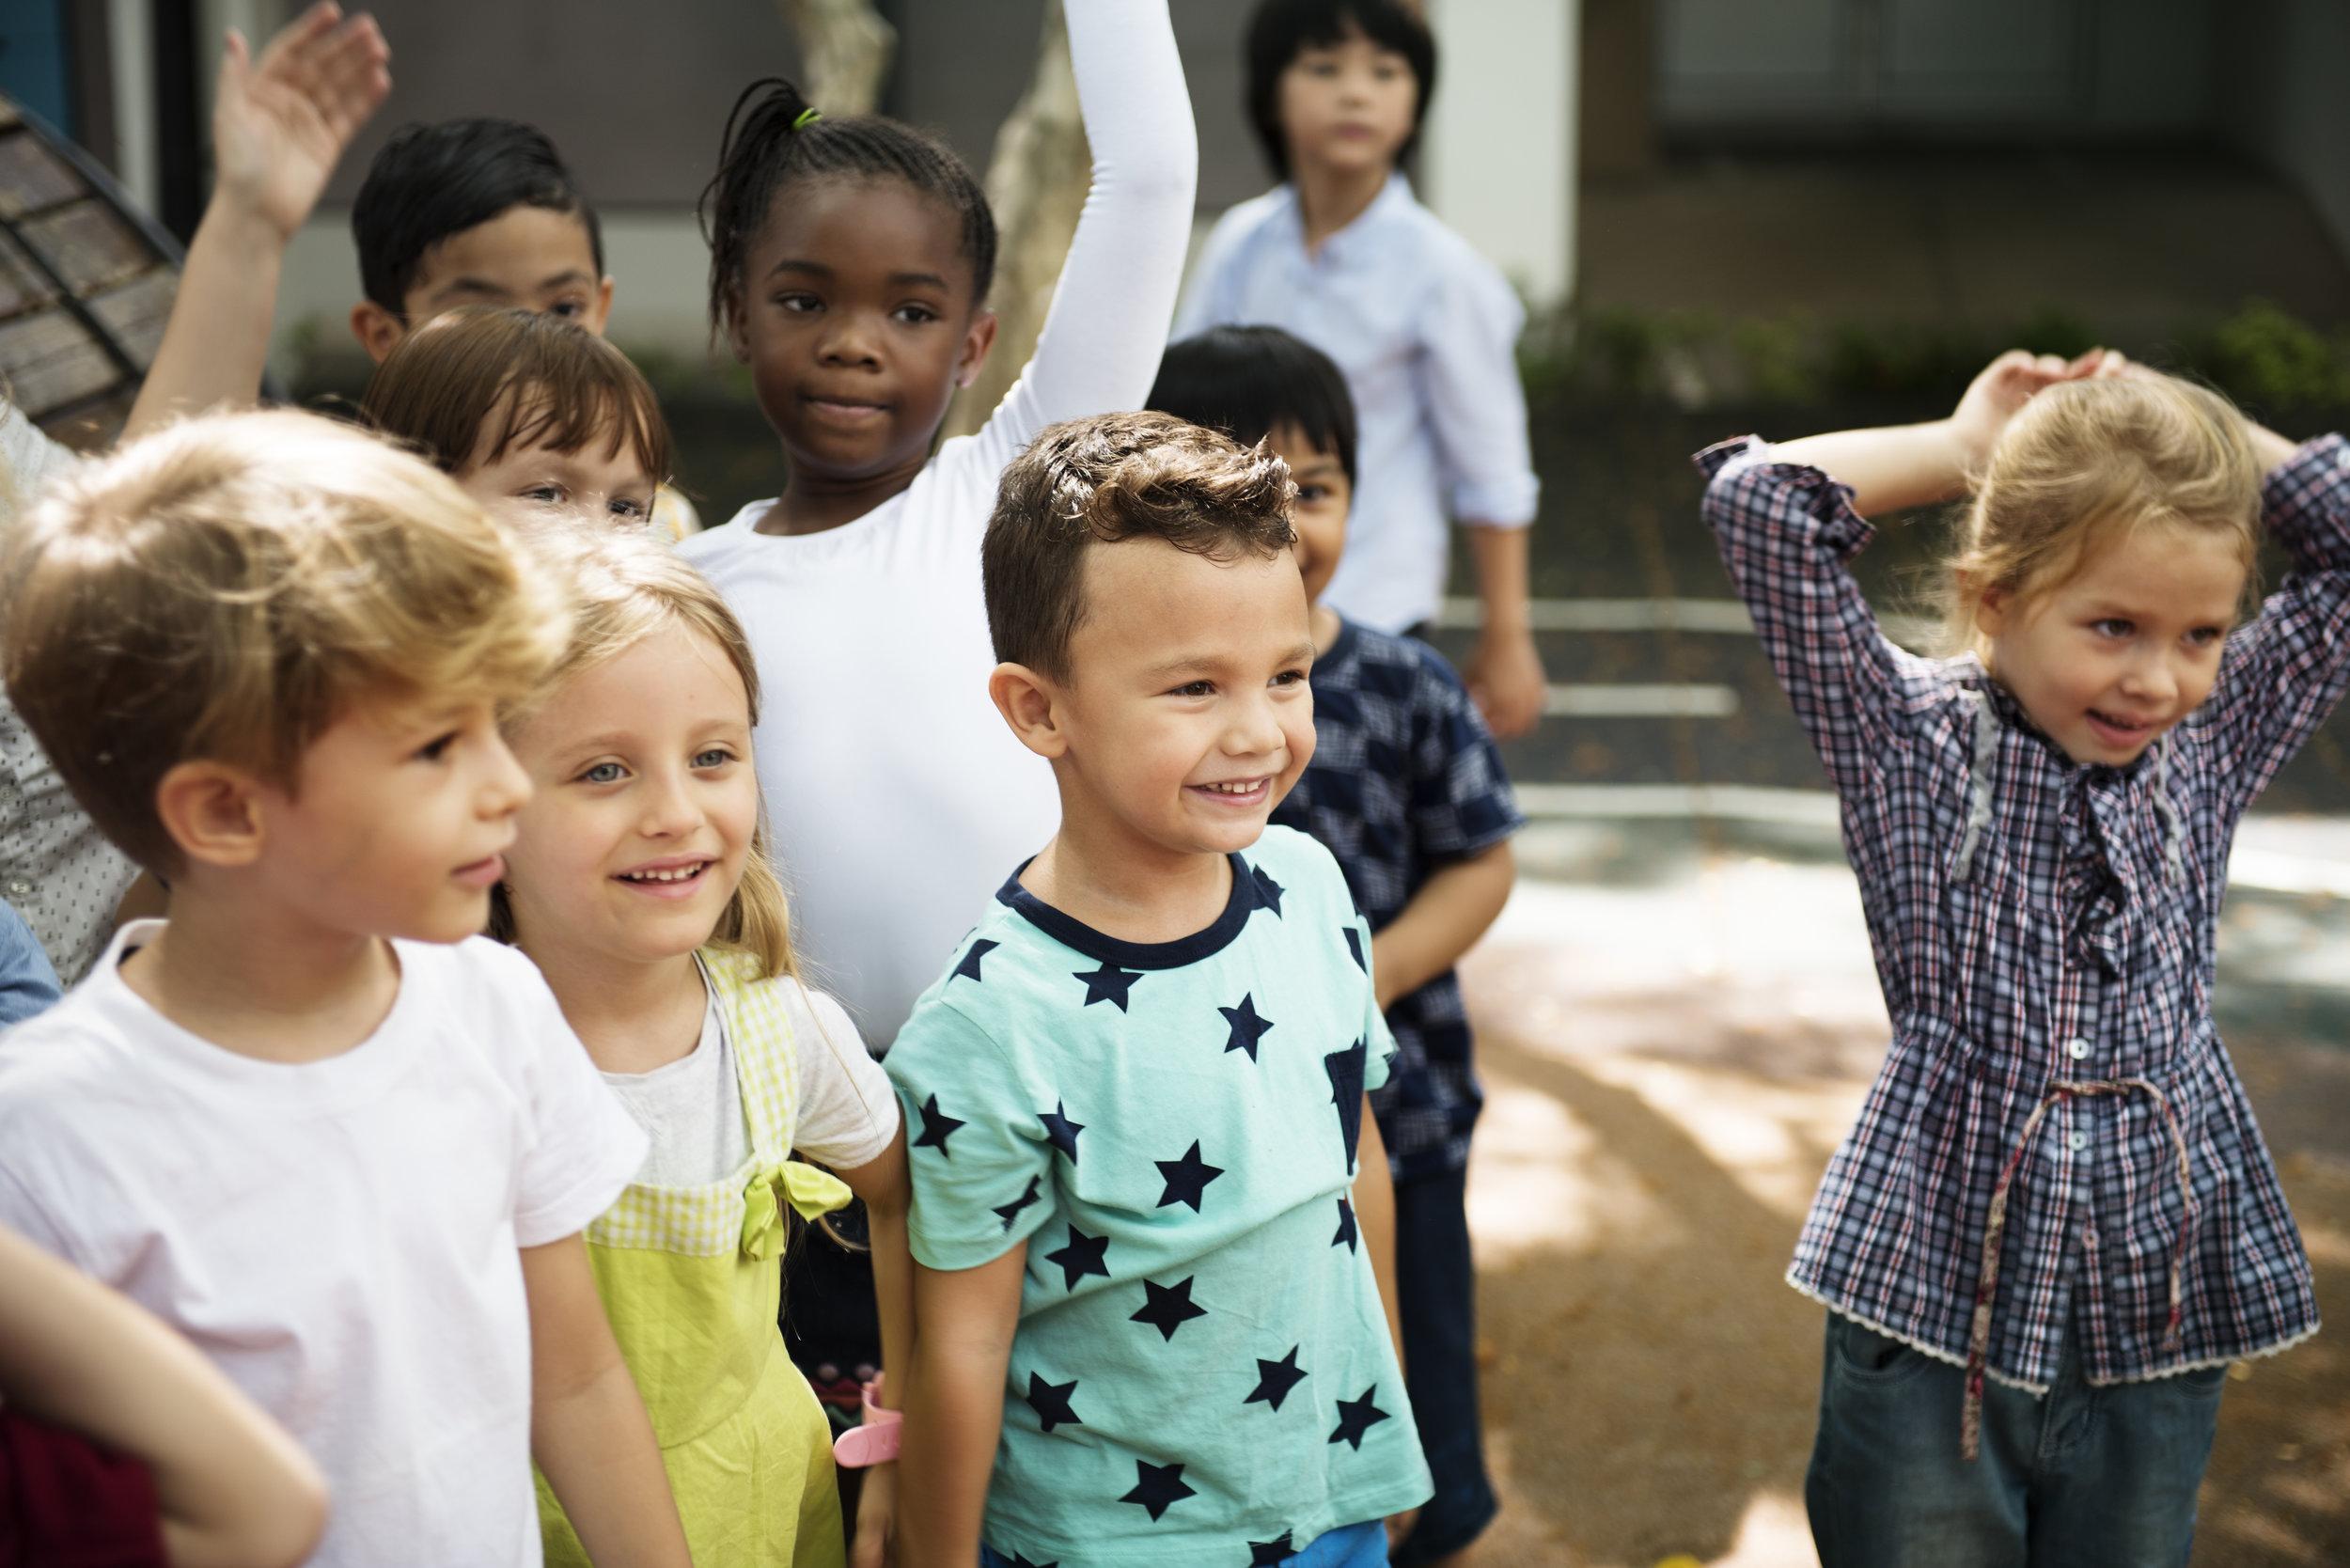 diverse-kids-standing-together-PU3B4SB.jpg